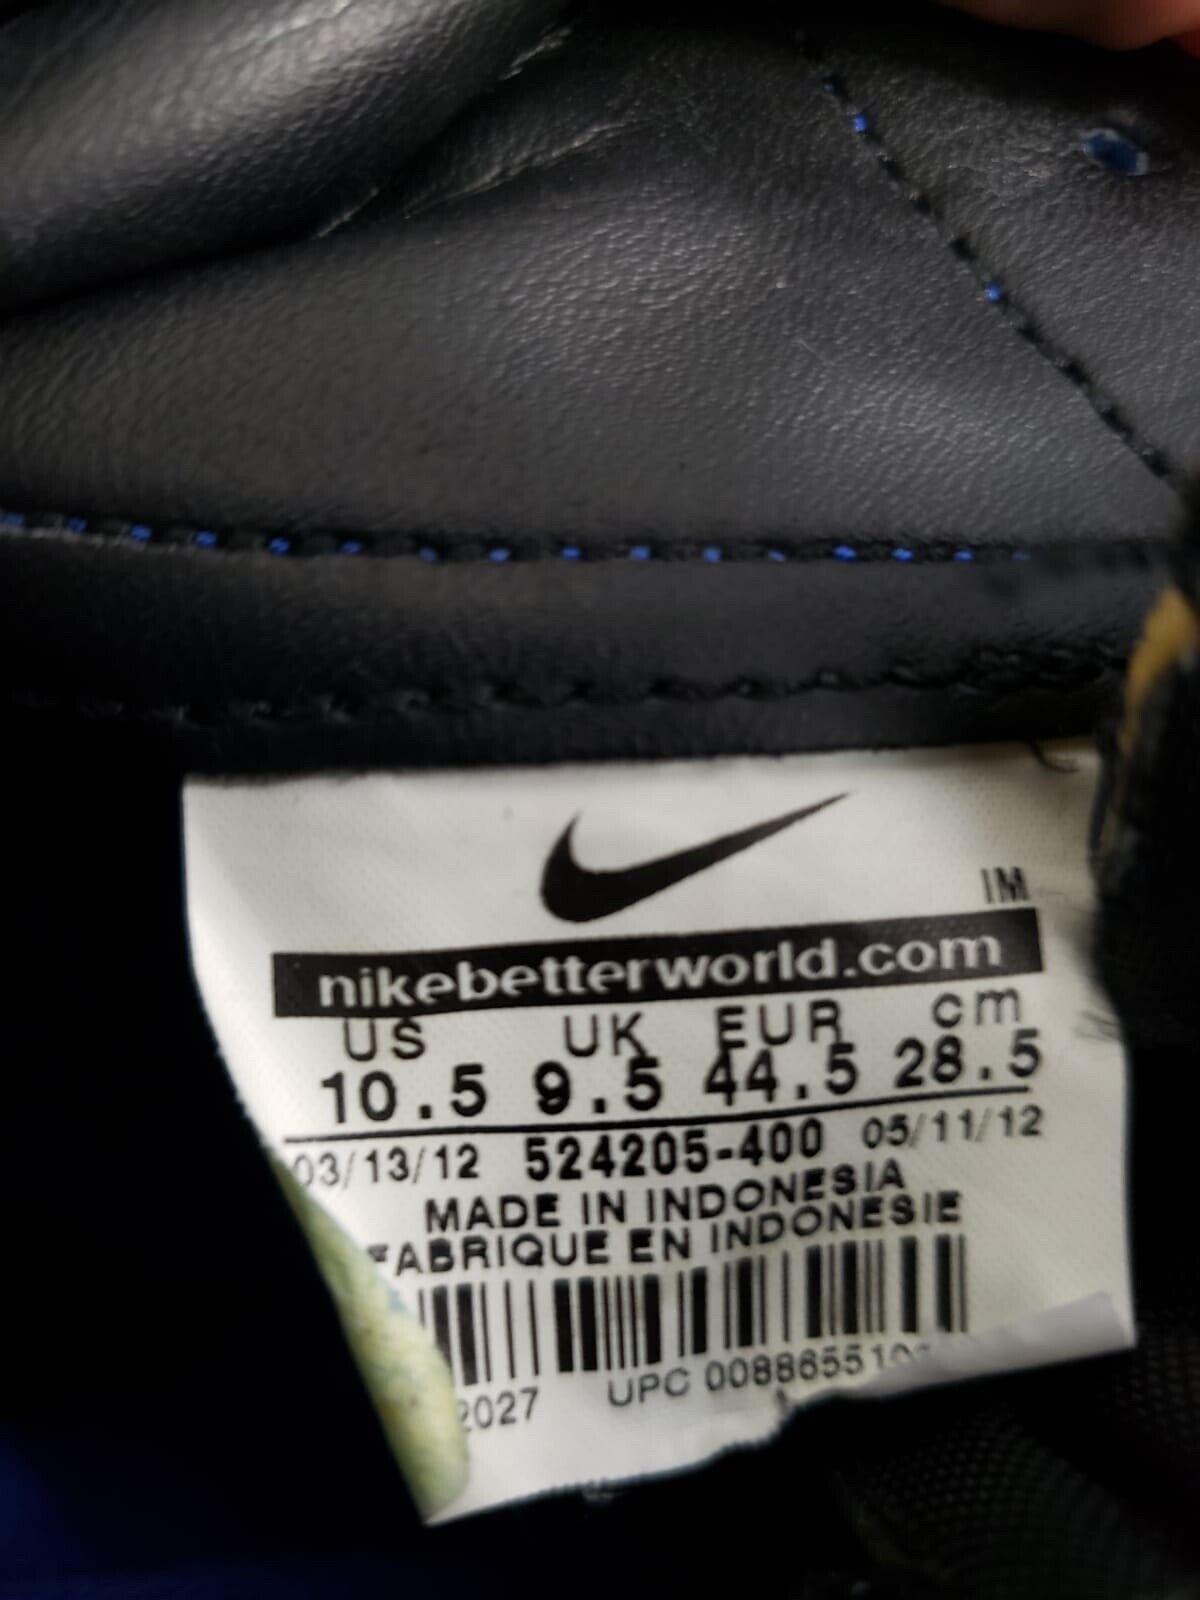 425a5495e34 ... Nike Blazer High VNTG Vintage Royal blueee White White White Supreme  Pacific  77 SB 344344